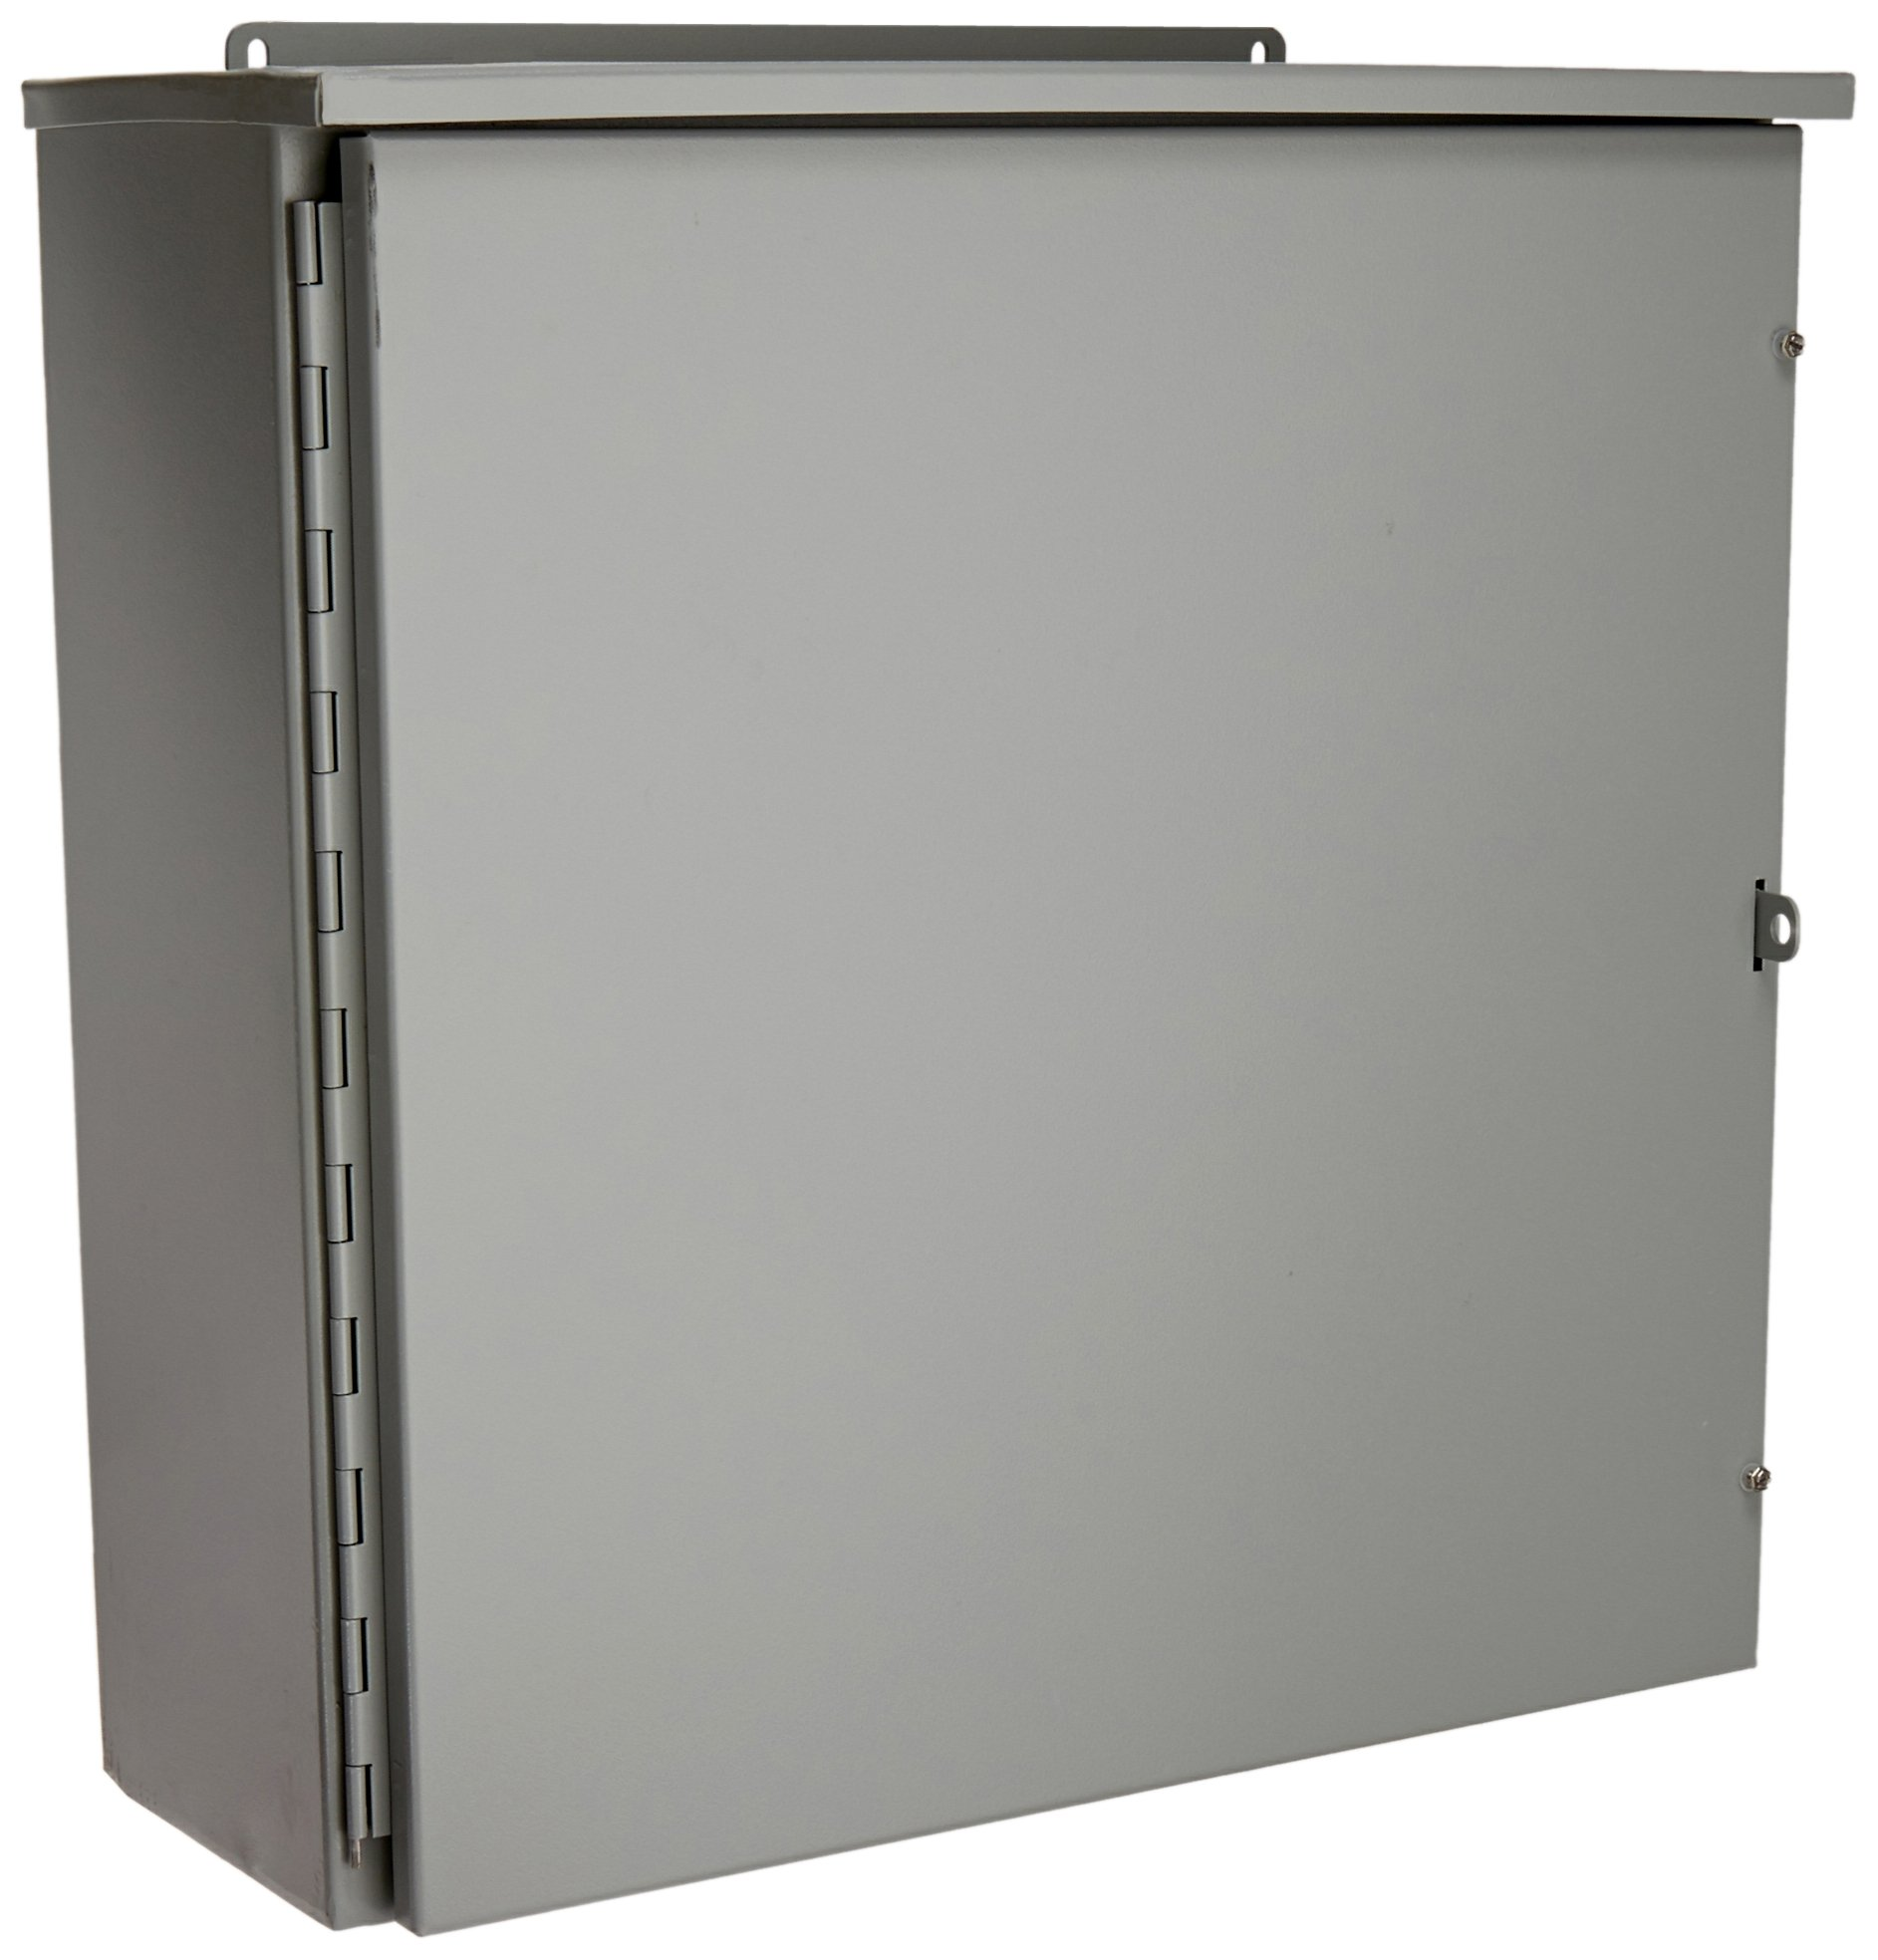 Wiegmann RHC242408 RHC-Series NEMA 3R Rainproof Hinge Cover Wall-Mount Enclosure, Carbon Steel, Medium, 24'' x 24'' x 8''